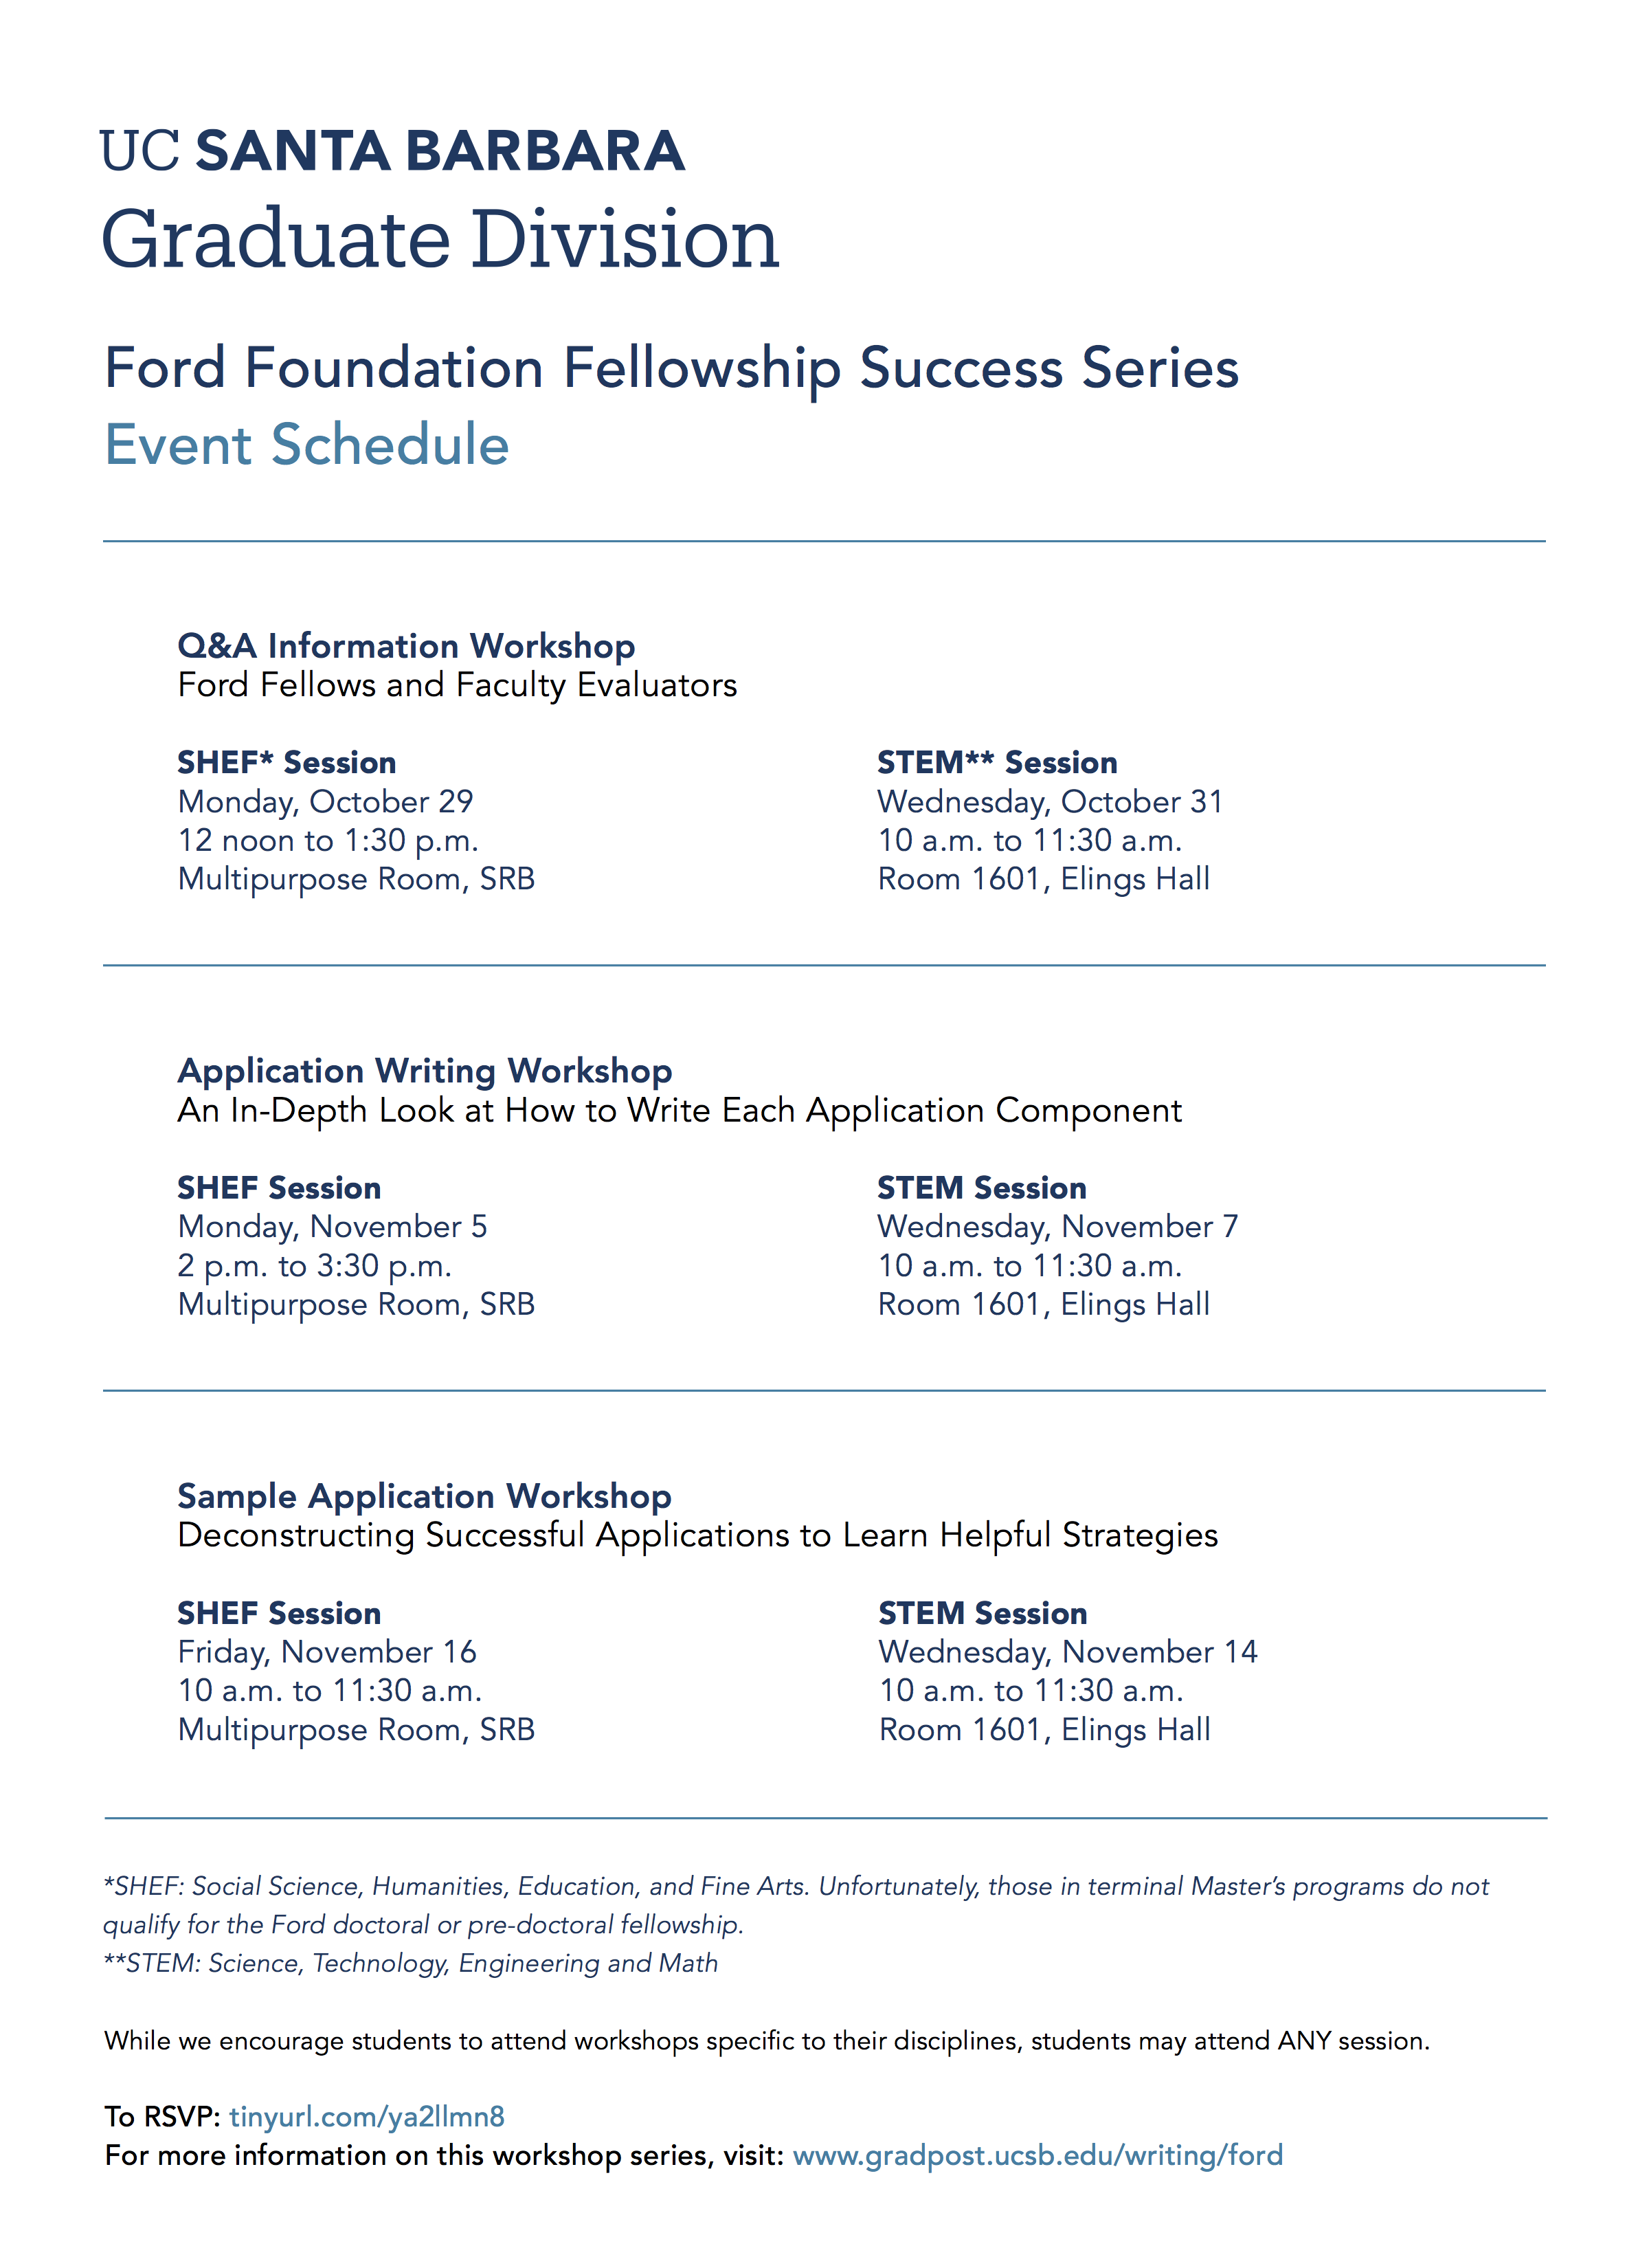 Ford Foundation Dissertation Fellowship